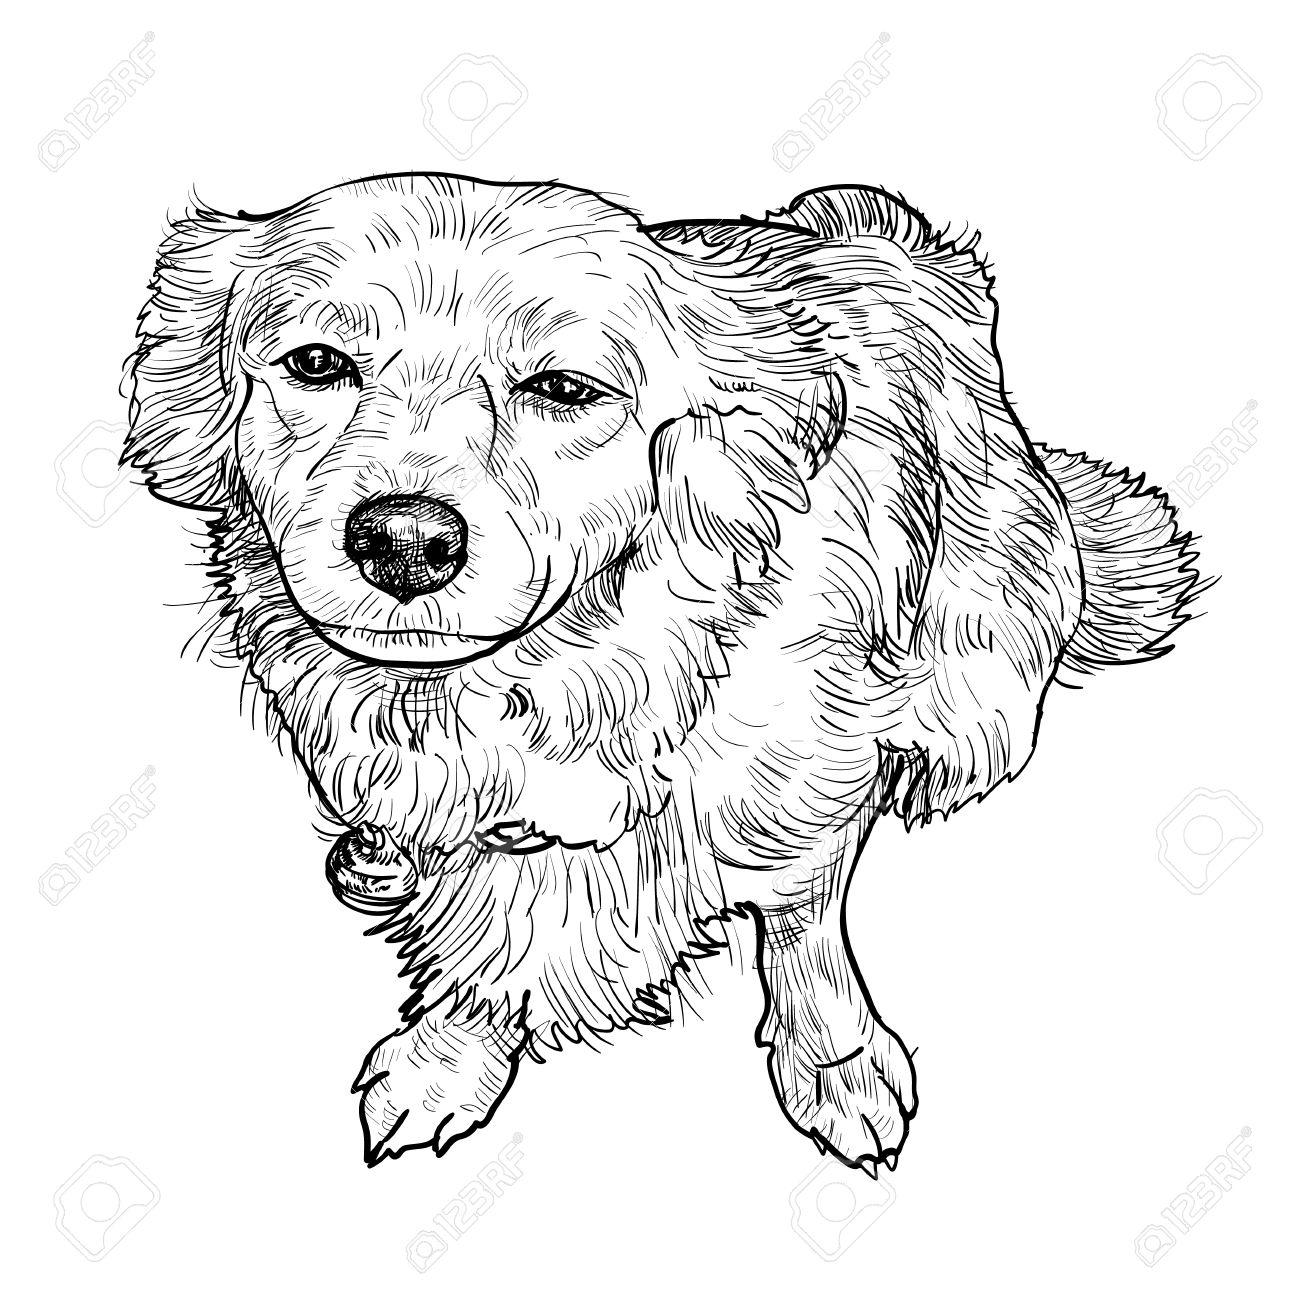 1300x1300 Drawing Of Mix Breeding Pomeranian And Shihtzu Royalty Free